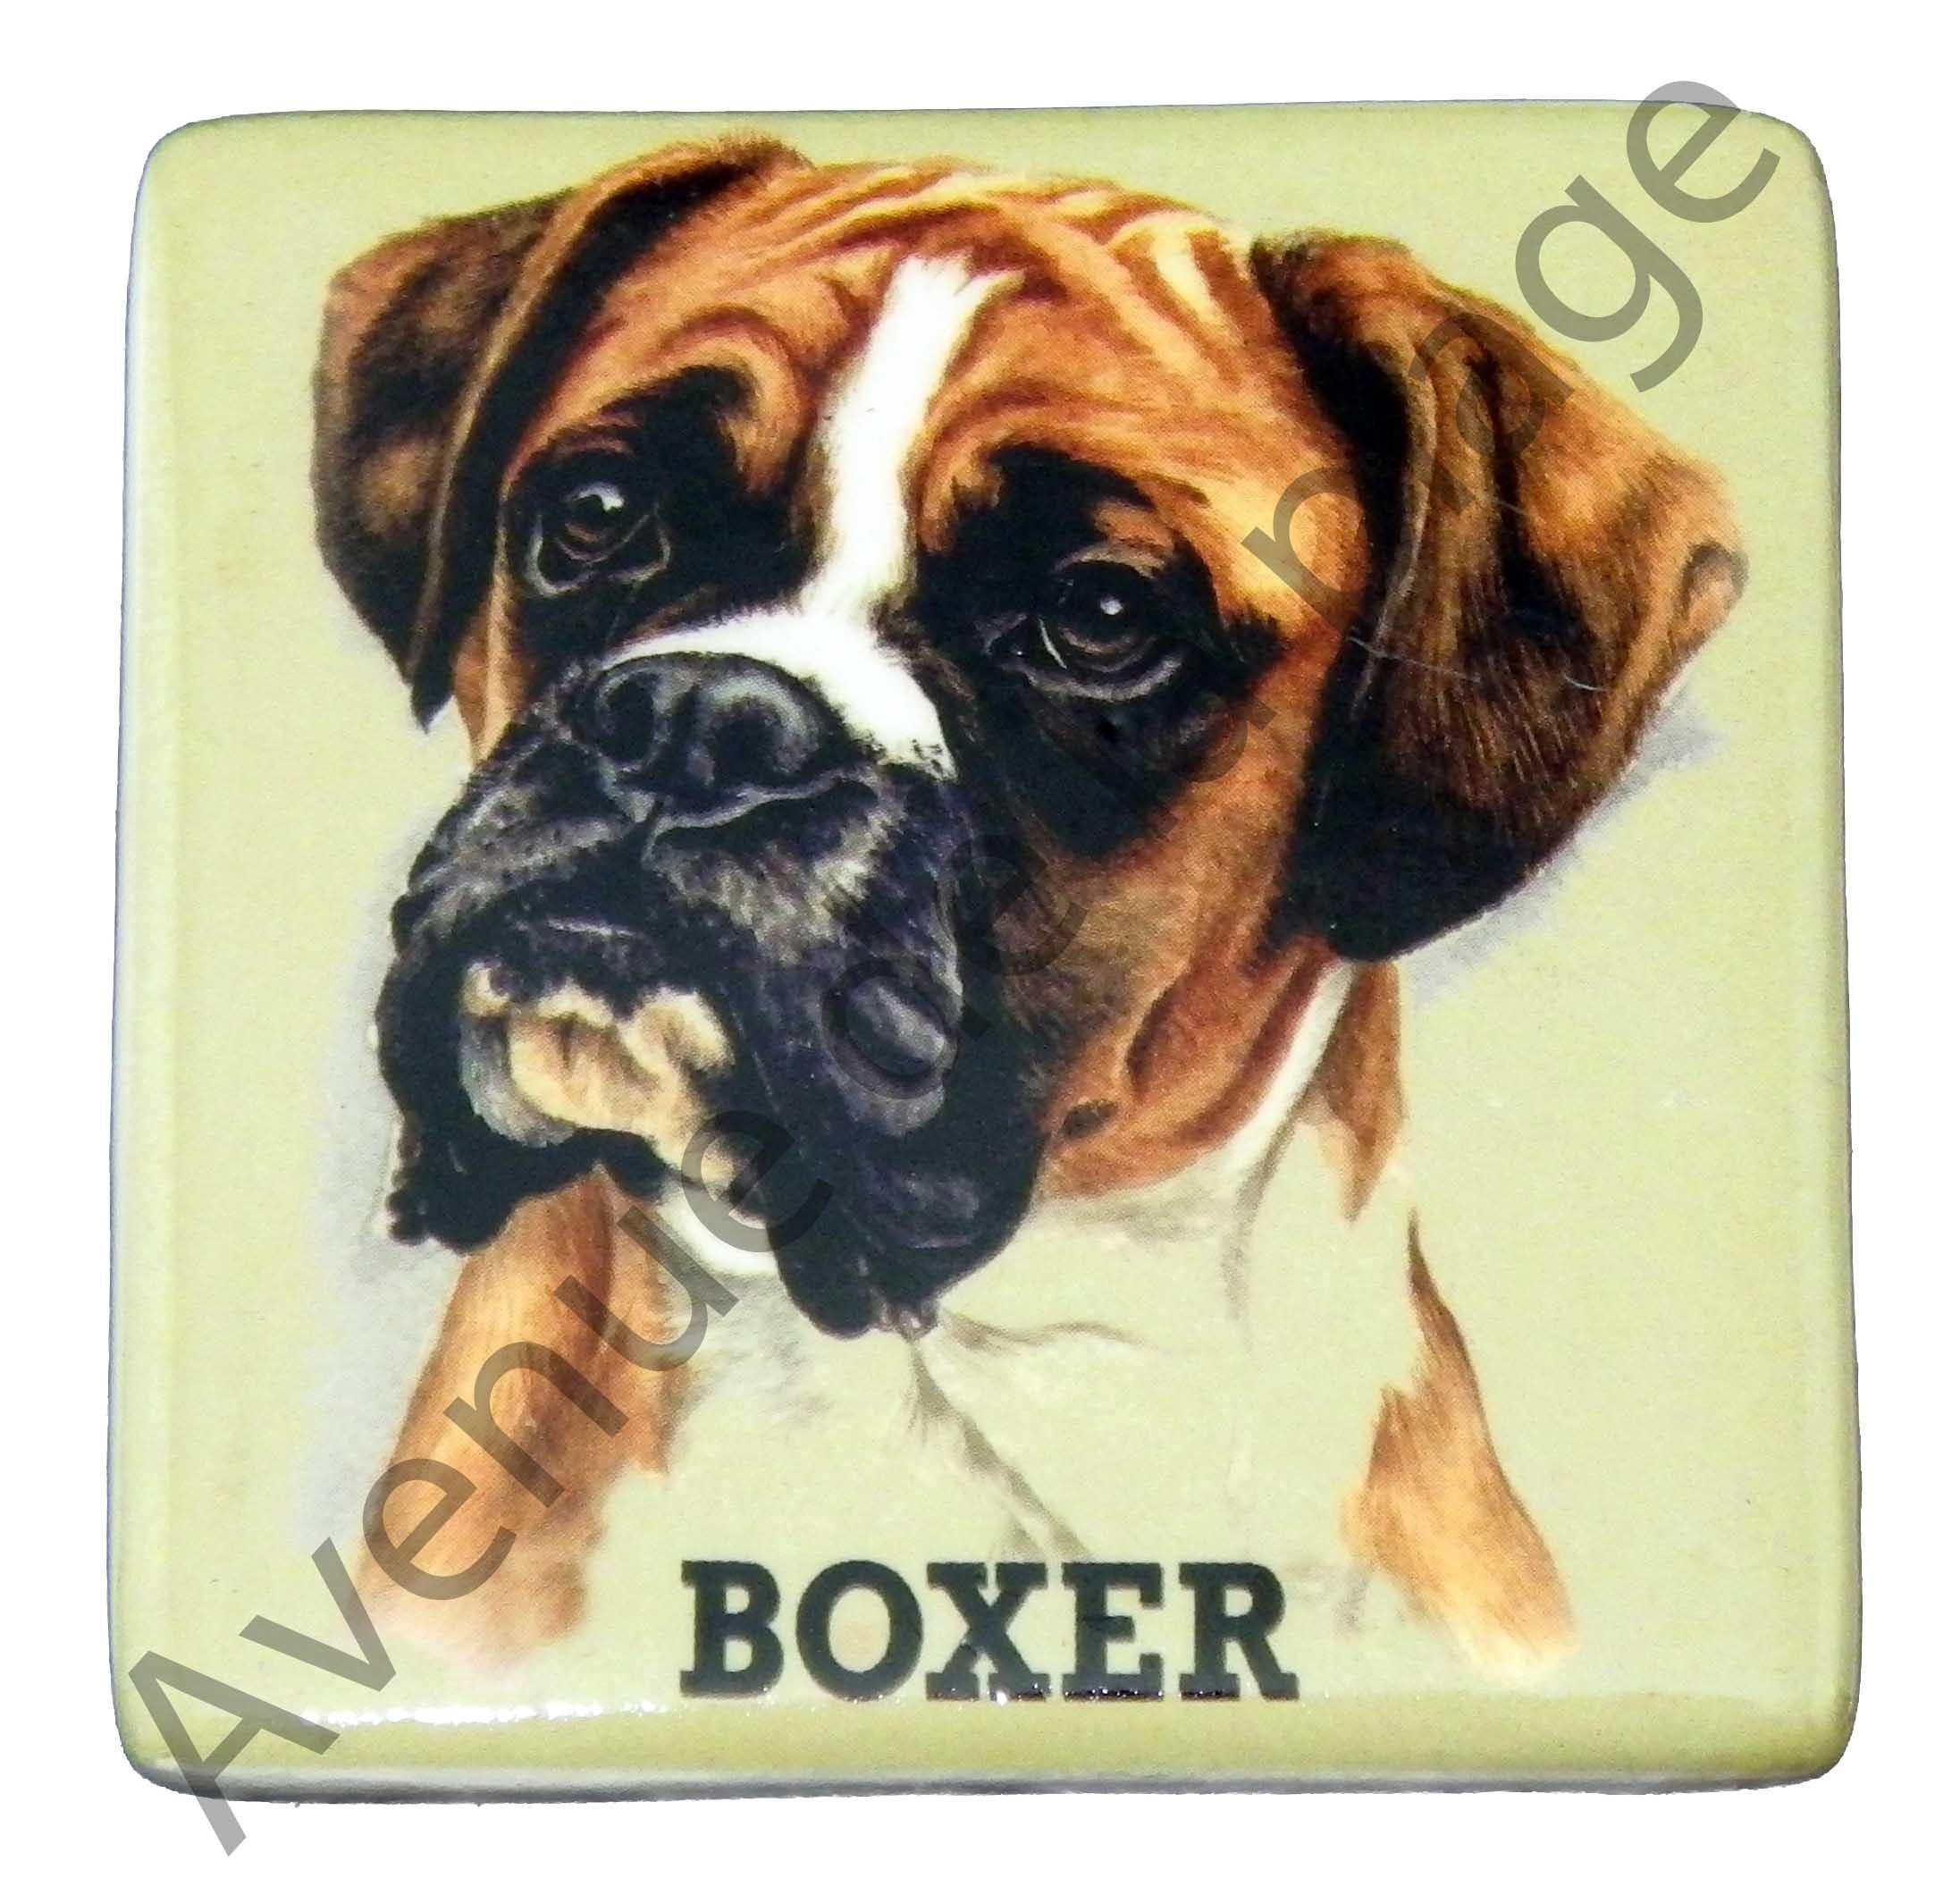 boxer pas cher gallery of diesel lot de boxers rays bleu diesel pour pas cher with boxer pas. Black Bedroom Furniture Sets. Home Design Ideas